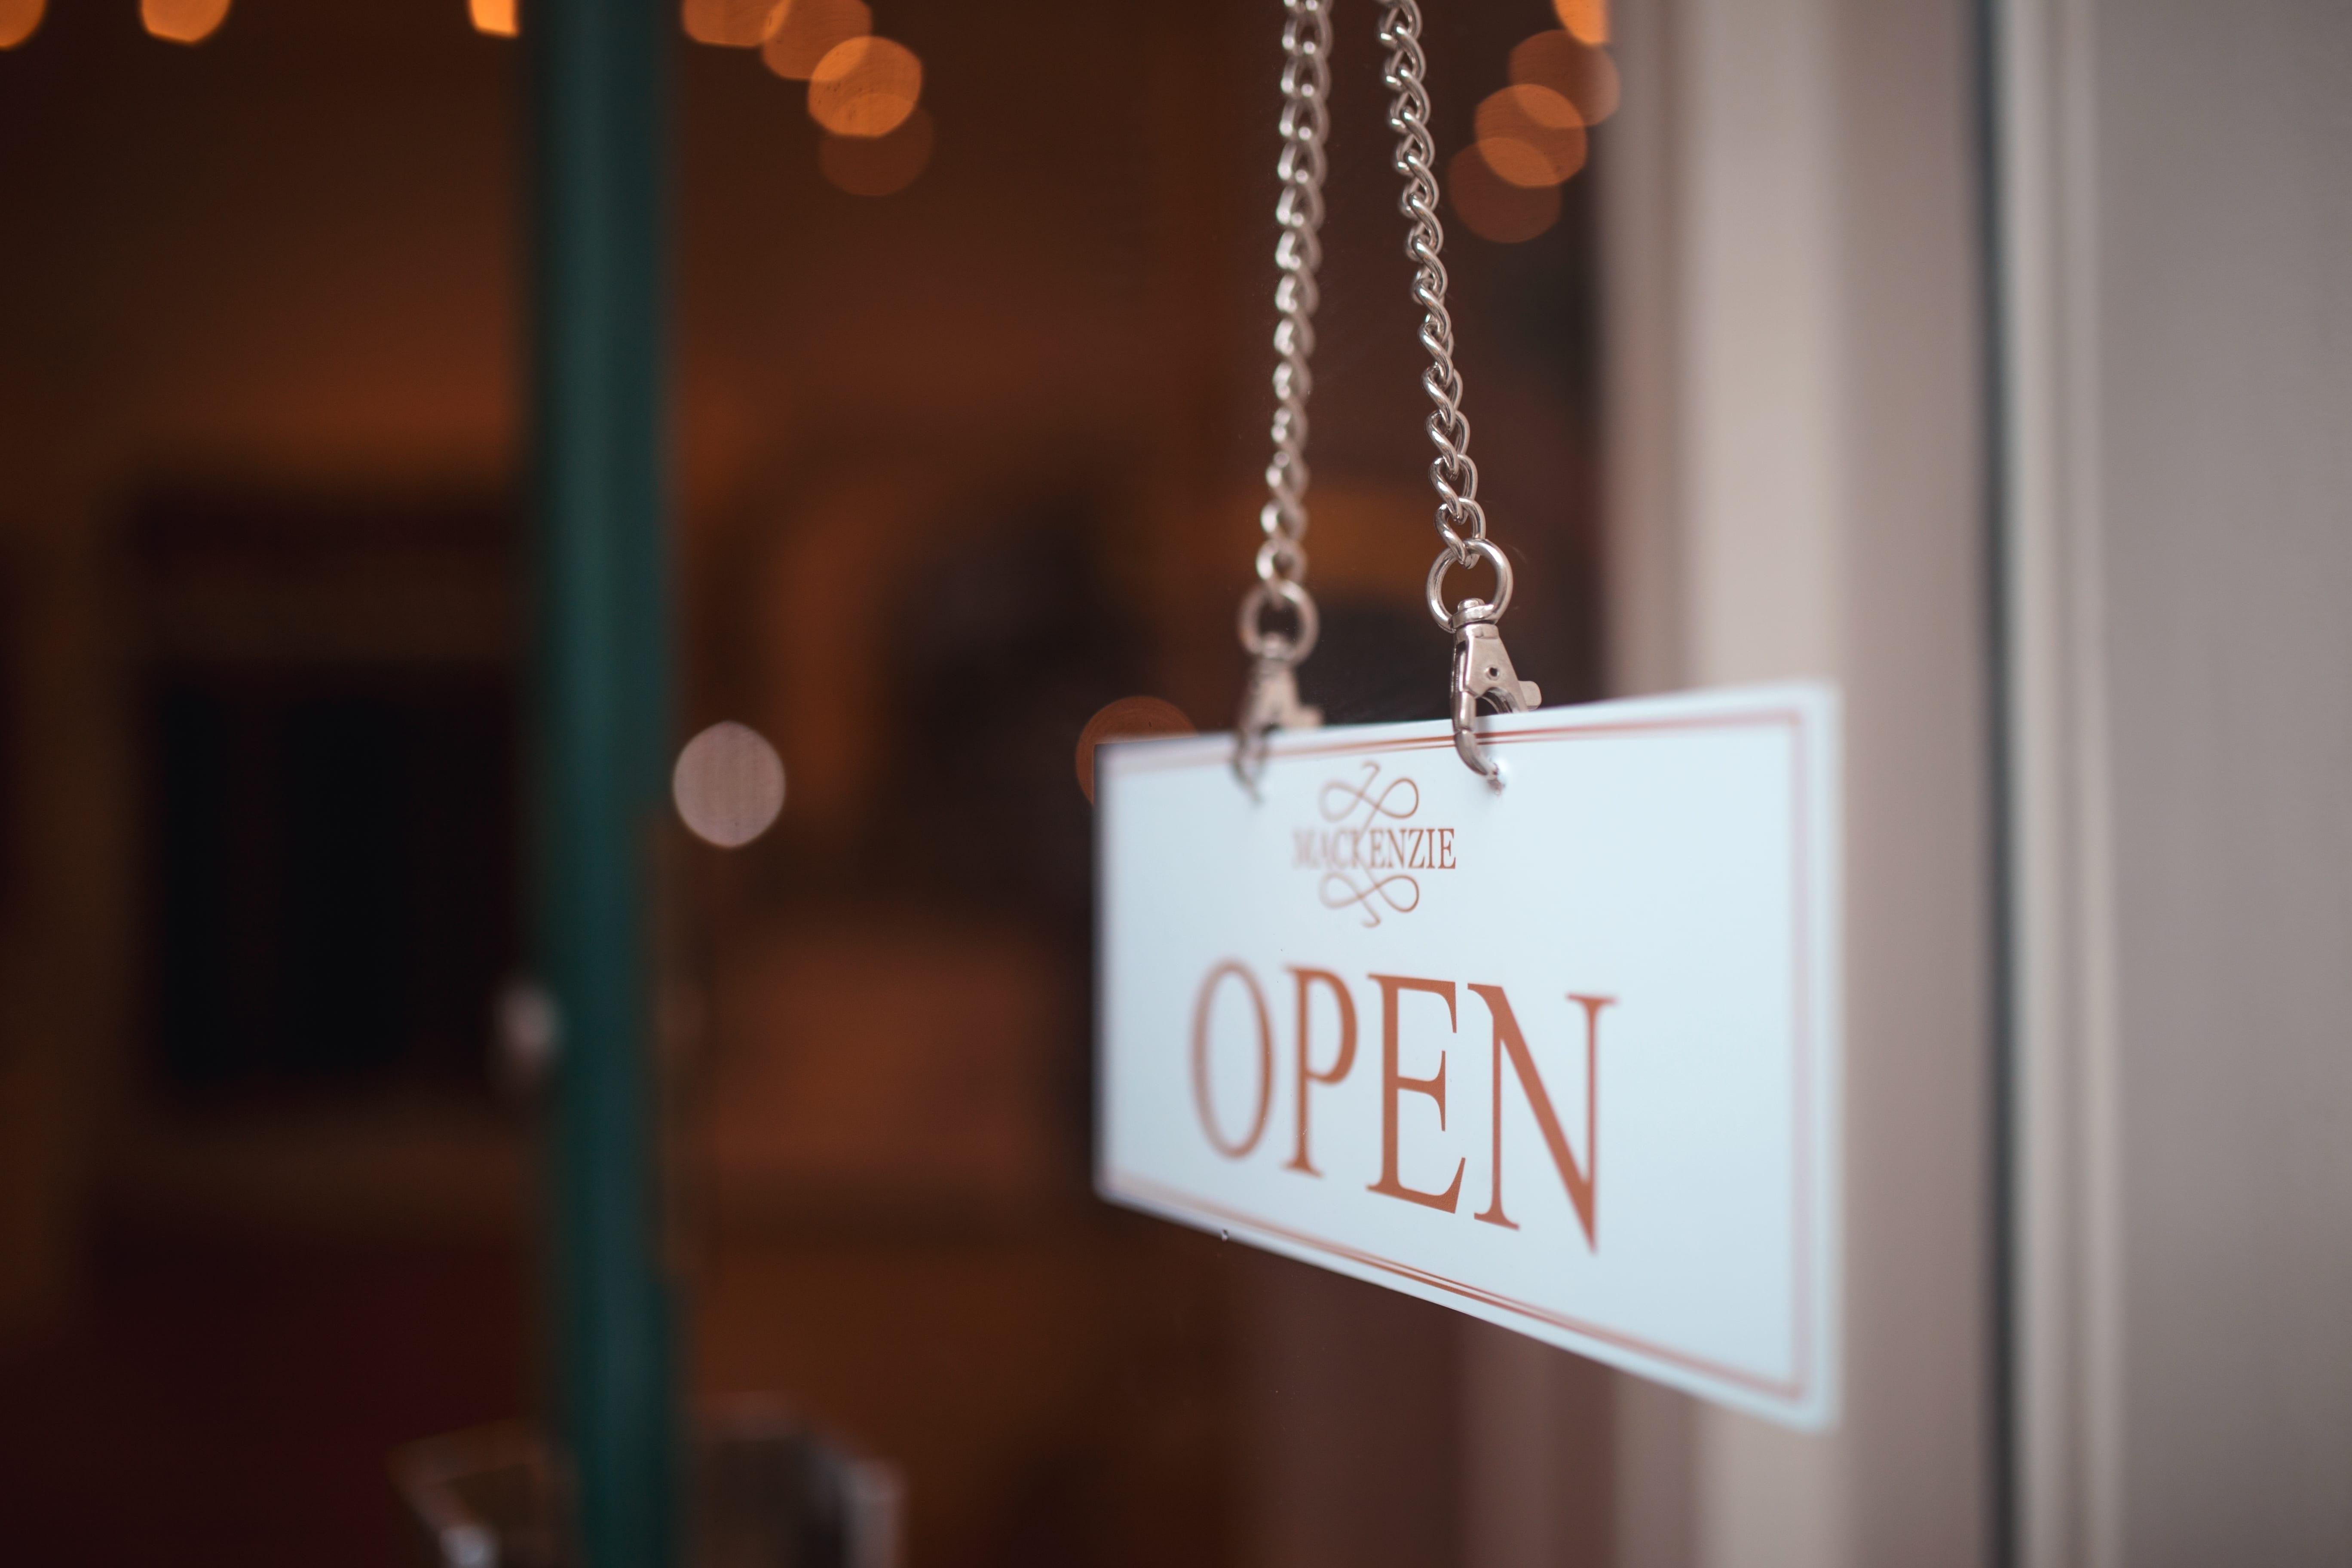 MacKenzie Leather Edinburgh - we are open